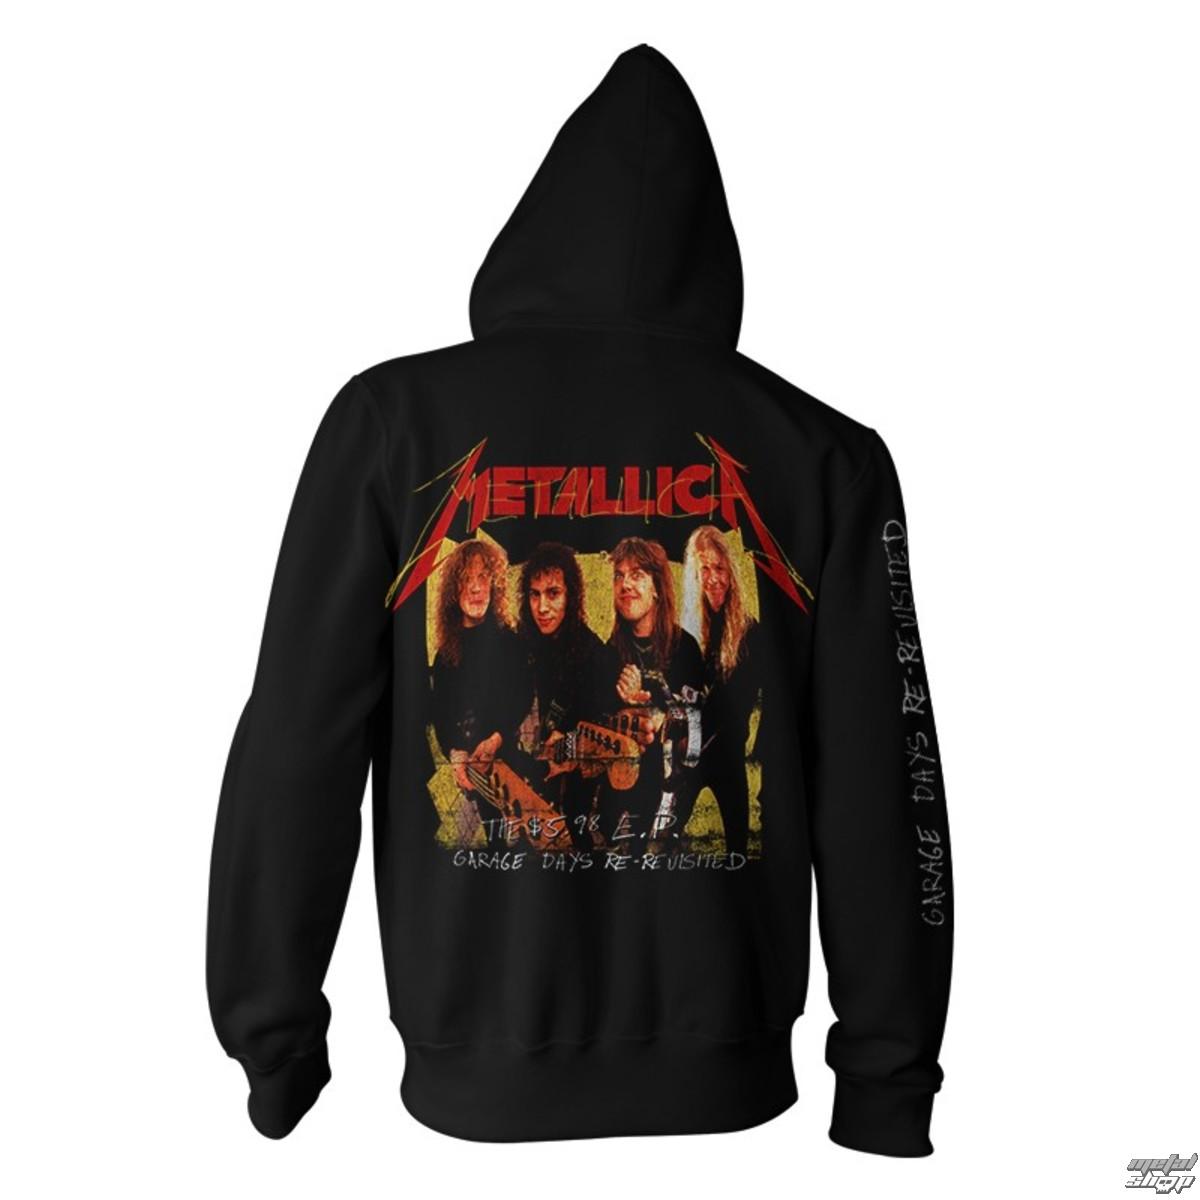 mikina pánská Metallica - Garage Photo - Yellow Black